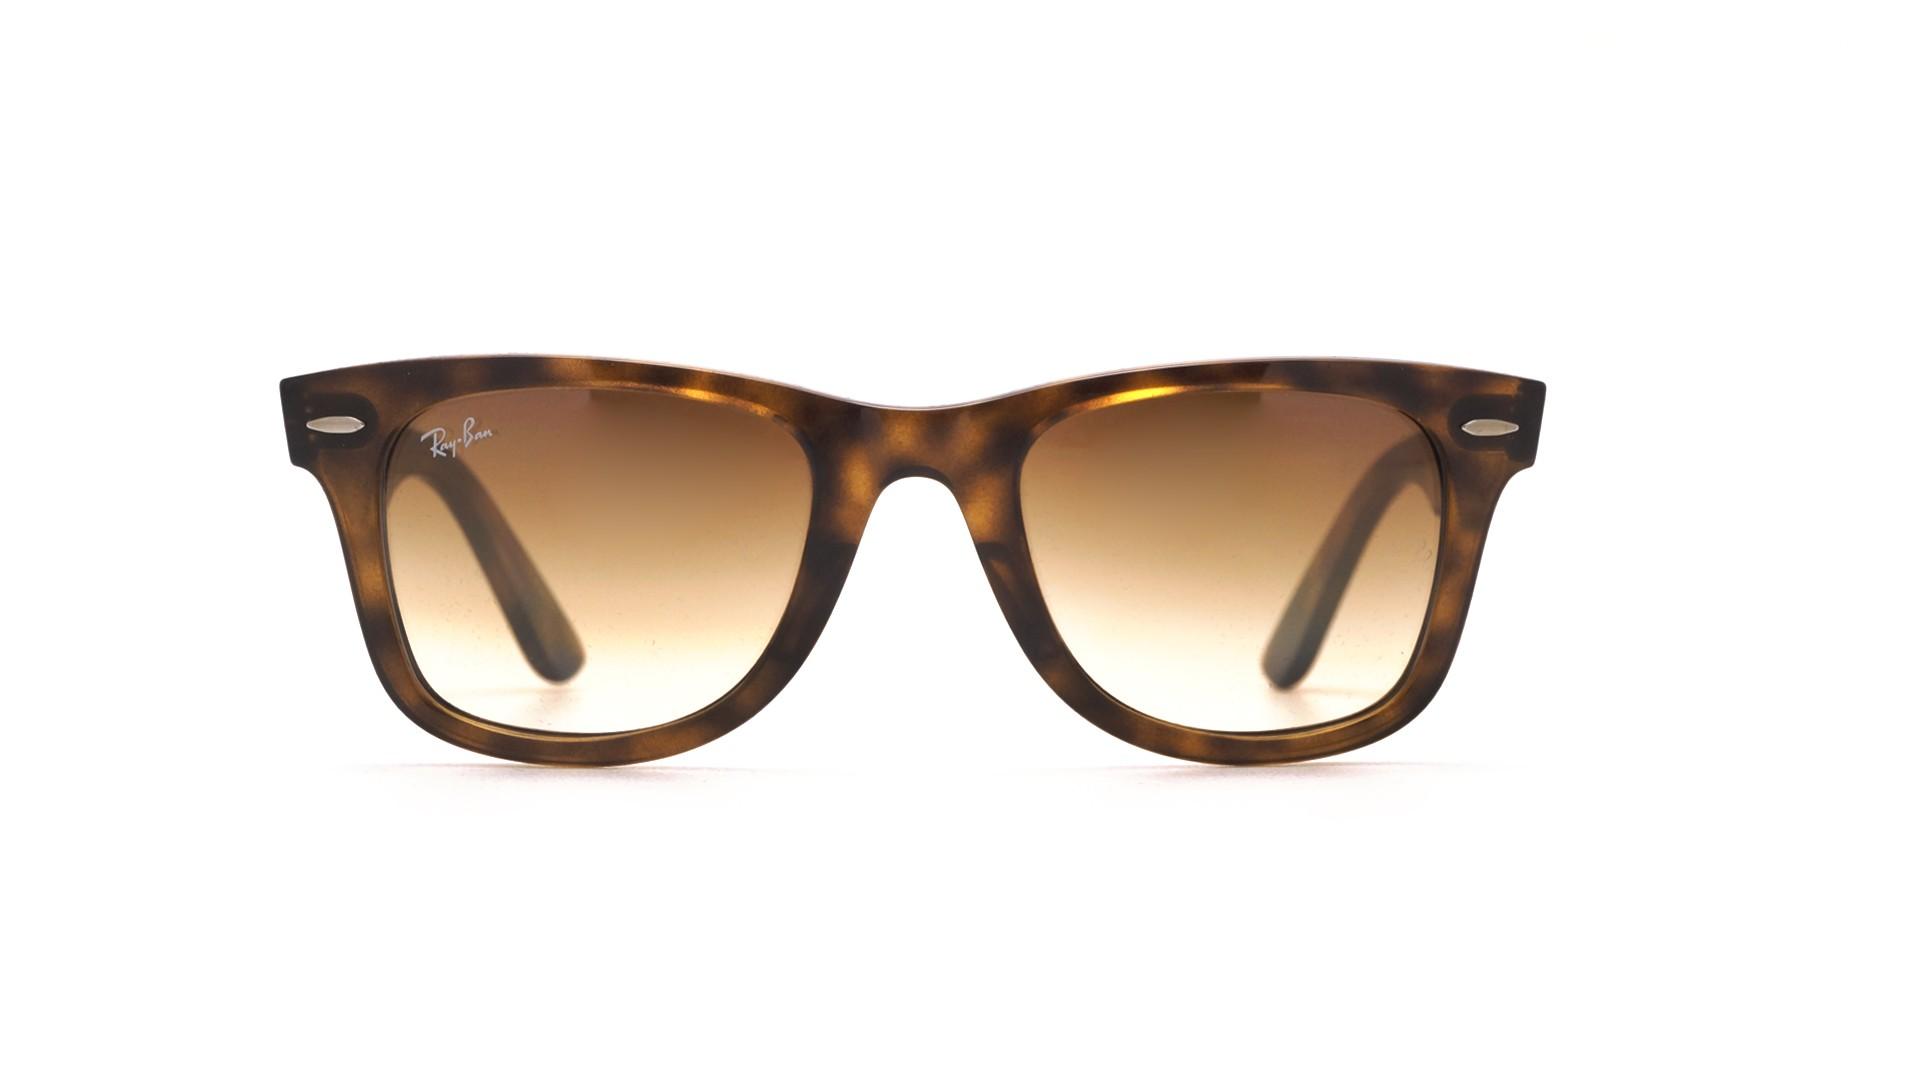 8b118a7794 Sunglasses Ray-Ban Wayfarer Ease Tortoise RB4340 710 51 50-22 Medium  Gradient